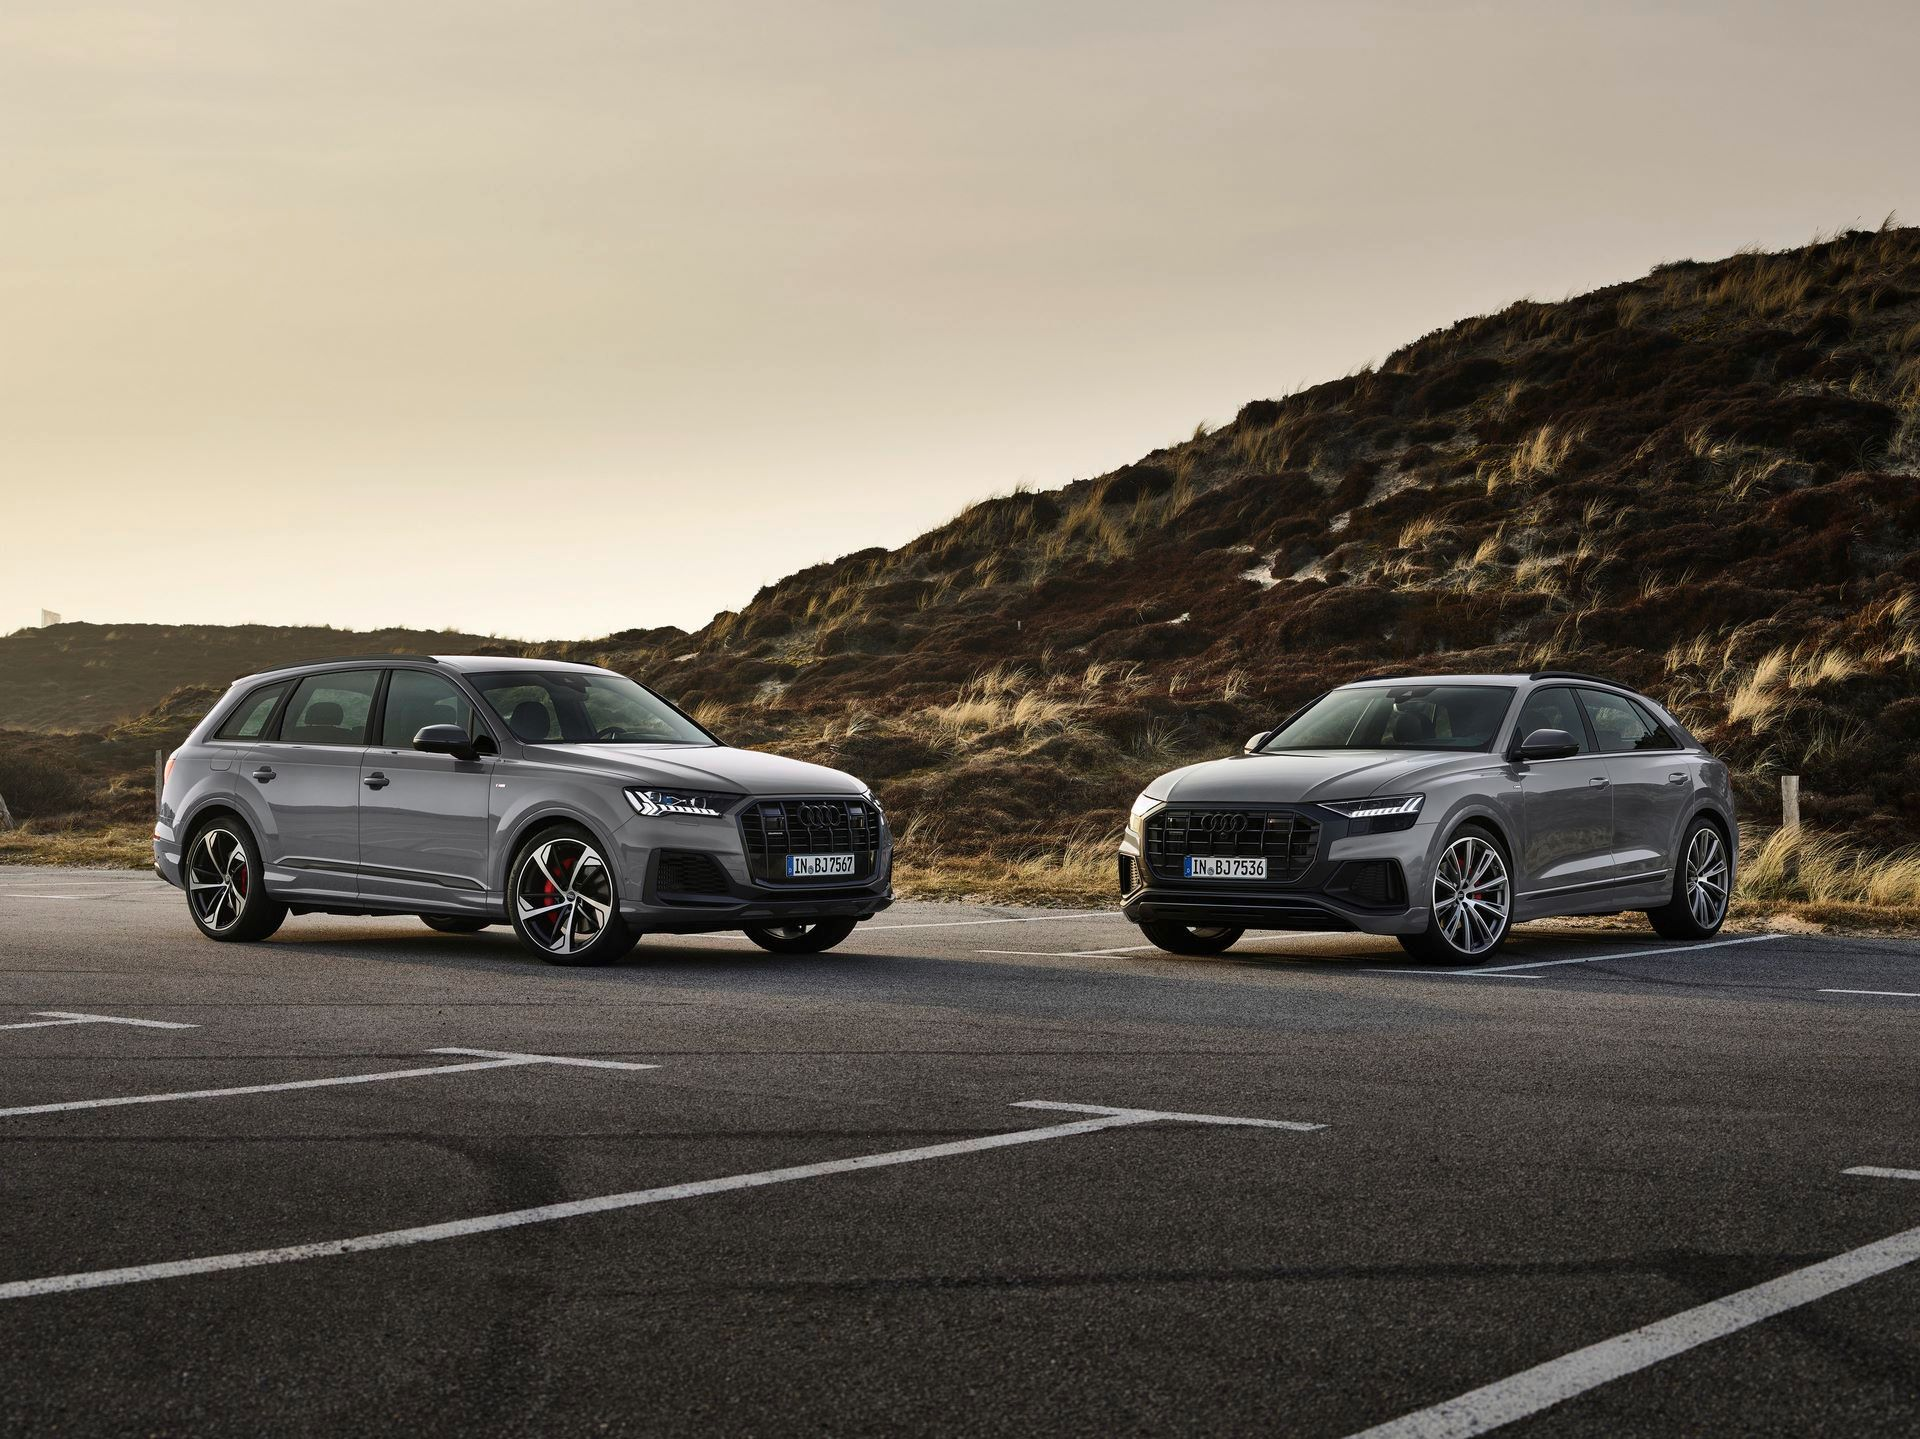 Audi-A4-A5-Q7-Q8-Competition-And-Competition-Plus-Trims-4